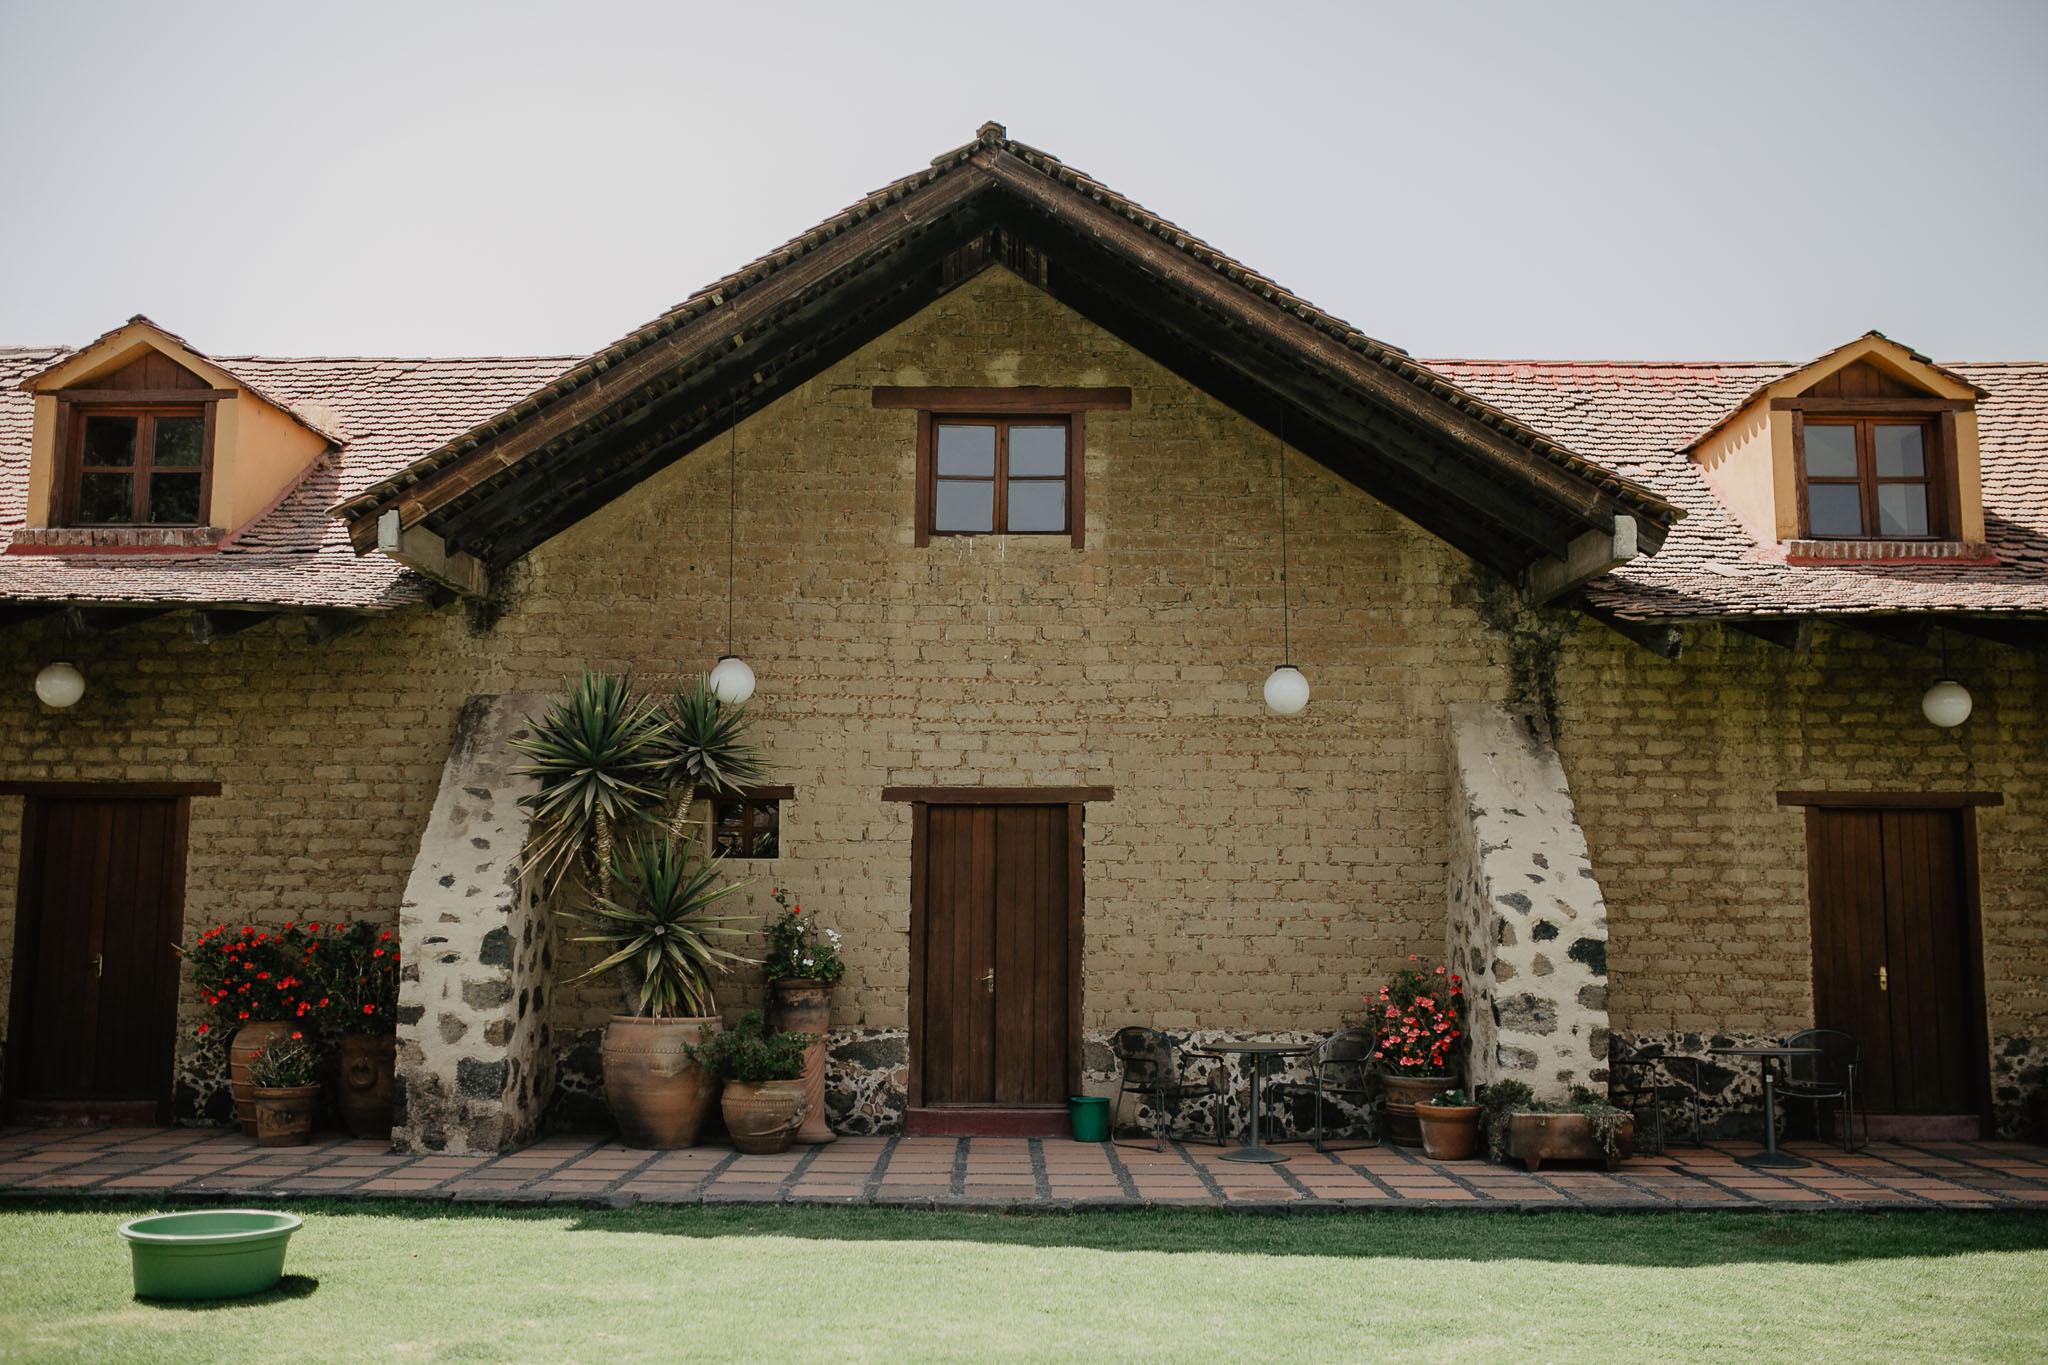 hacienda-san-andres-IMG_7147.jpg